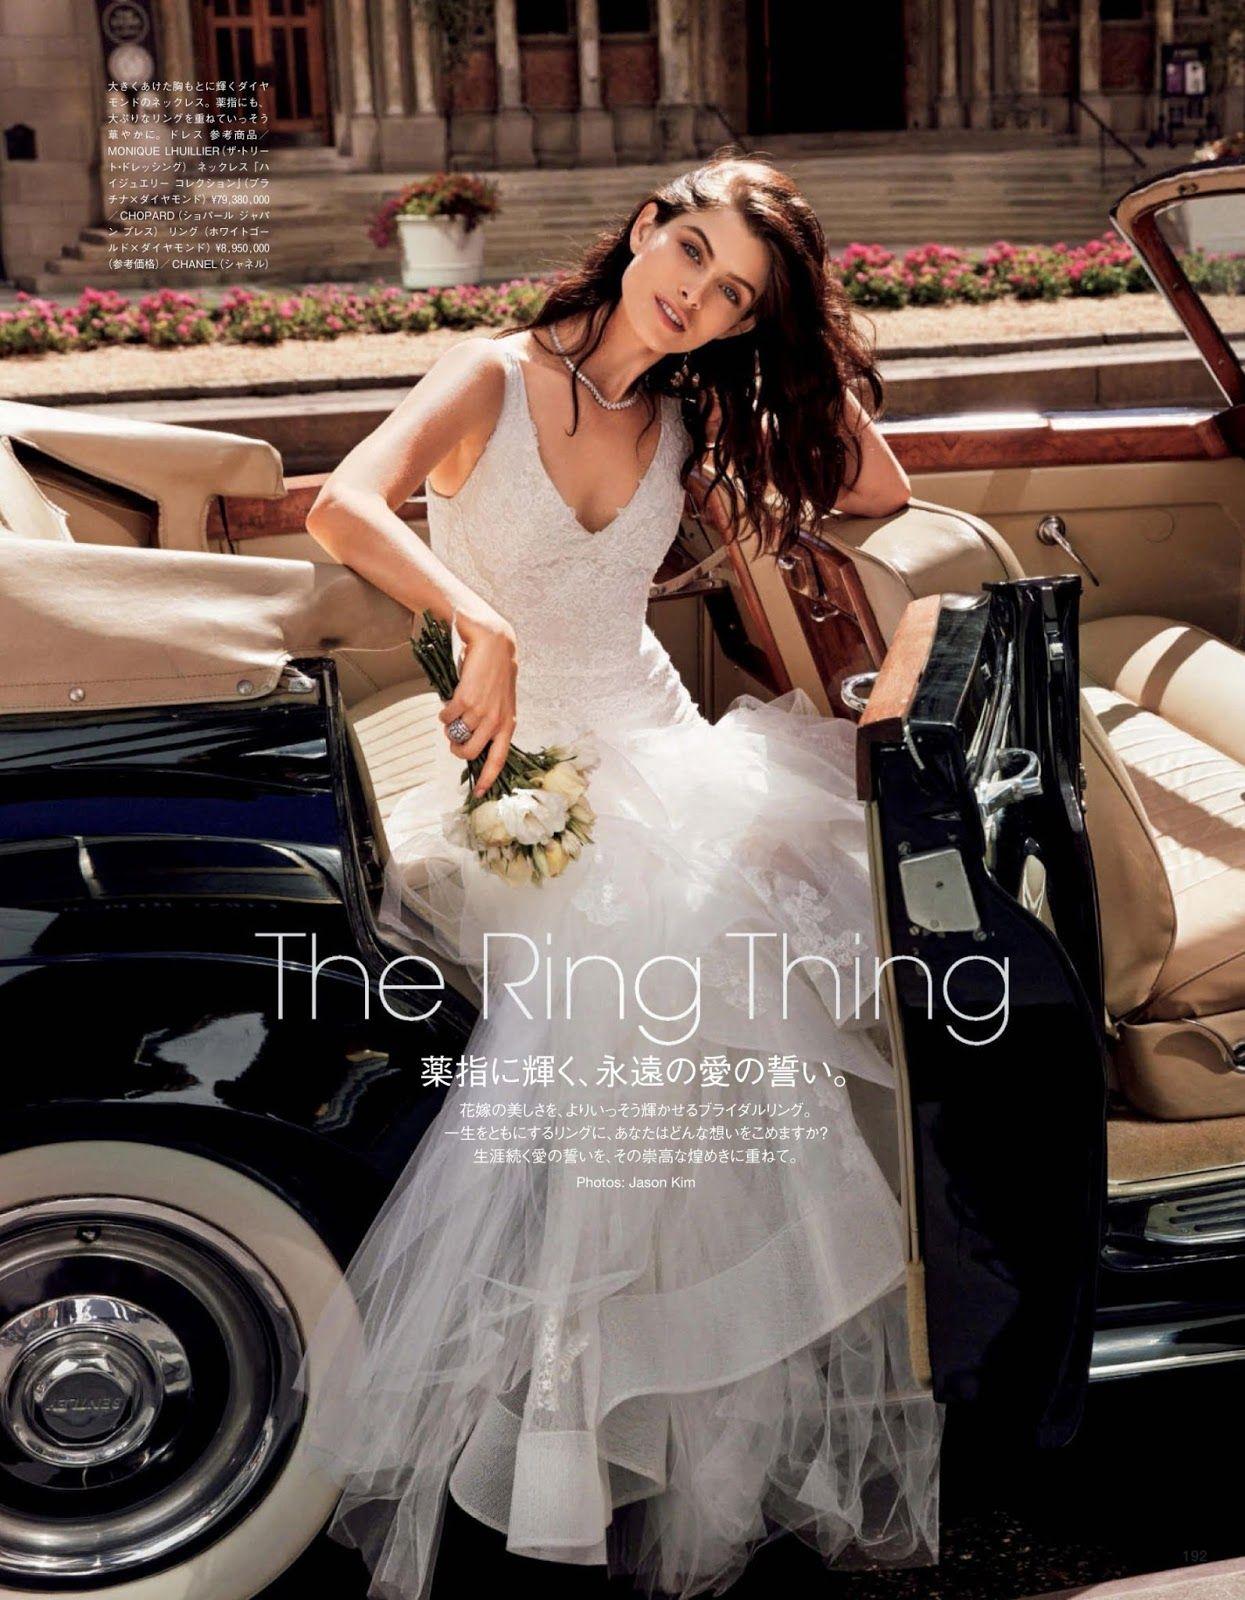 Pamela Bernier for Vogue Japan Wedding December 2015